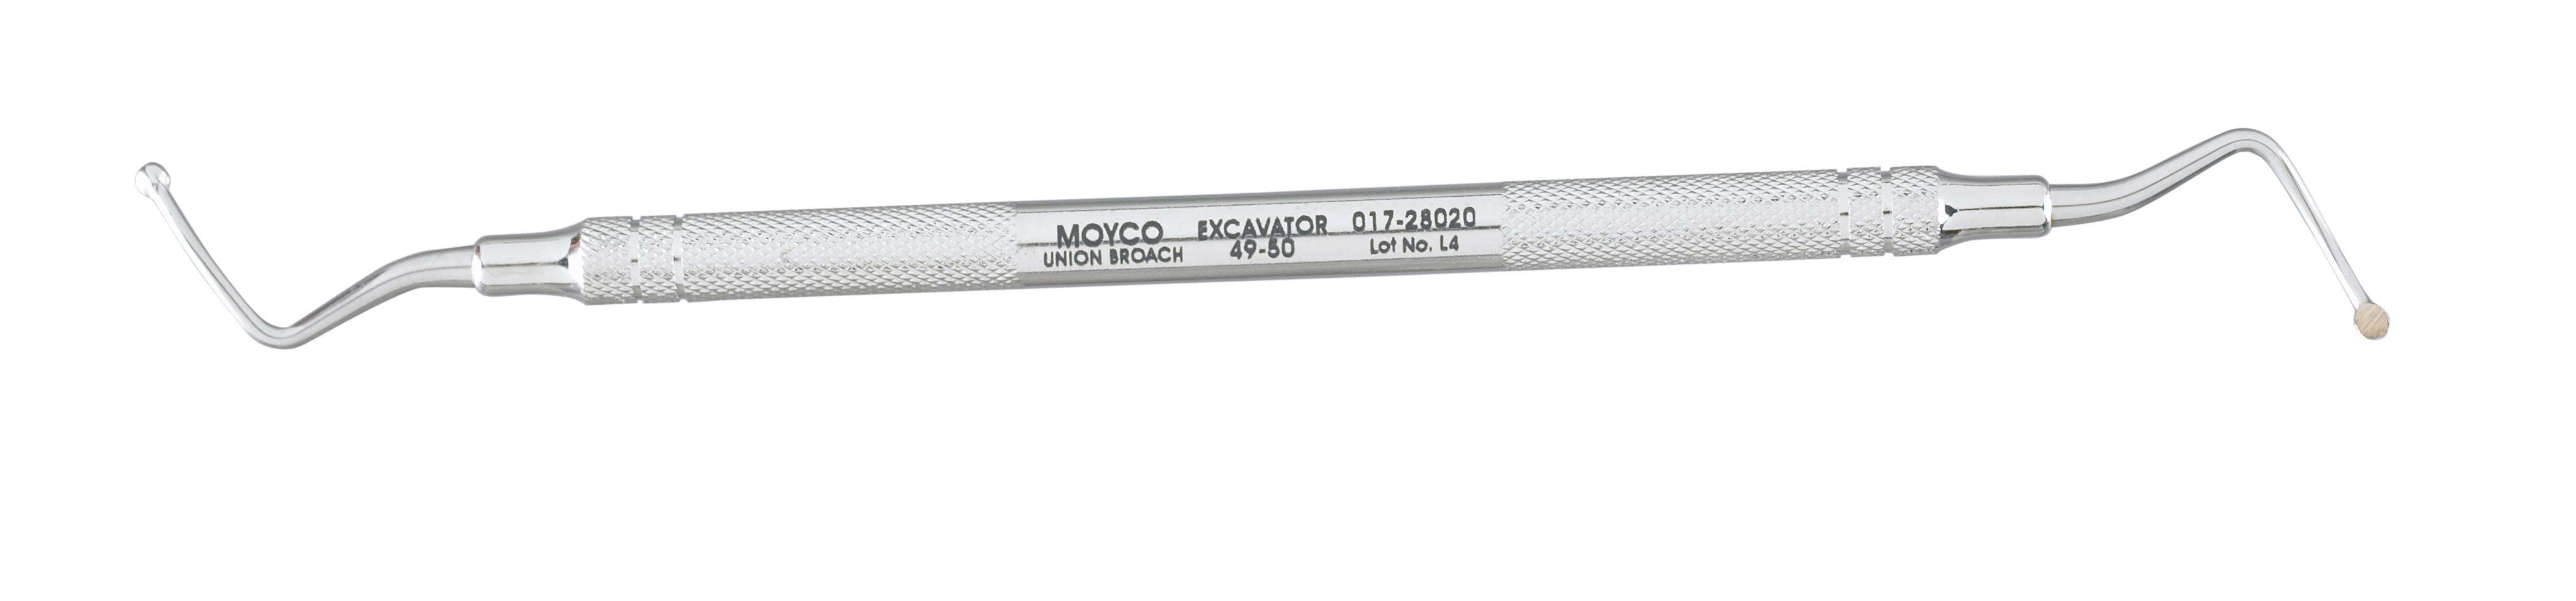 excavator-49-50-017-28020-miltex.jpg